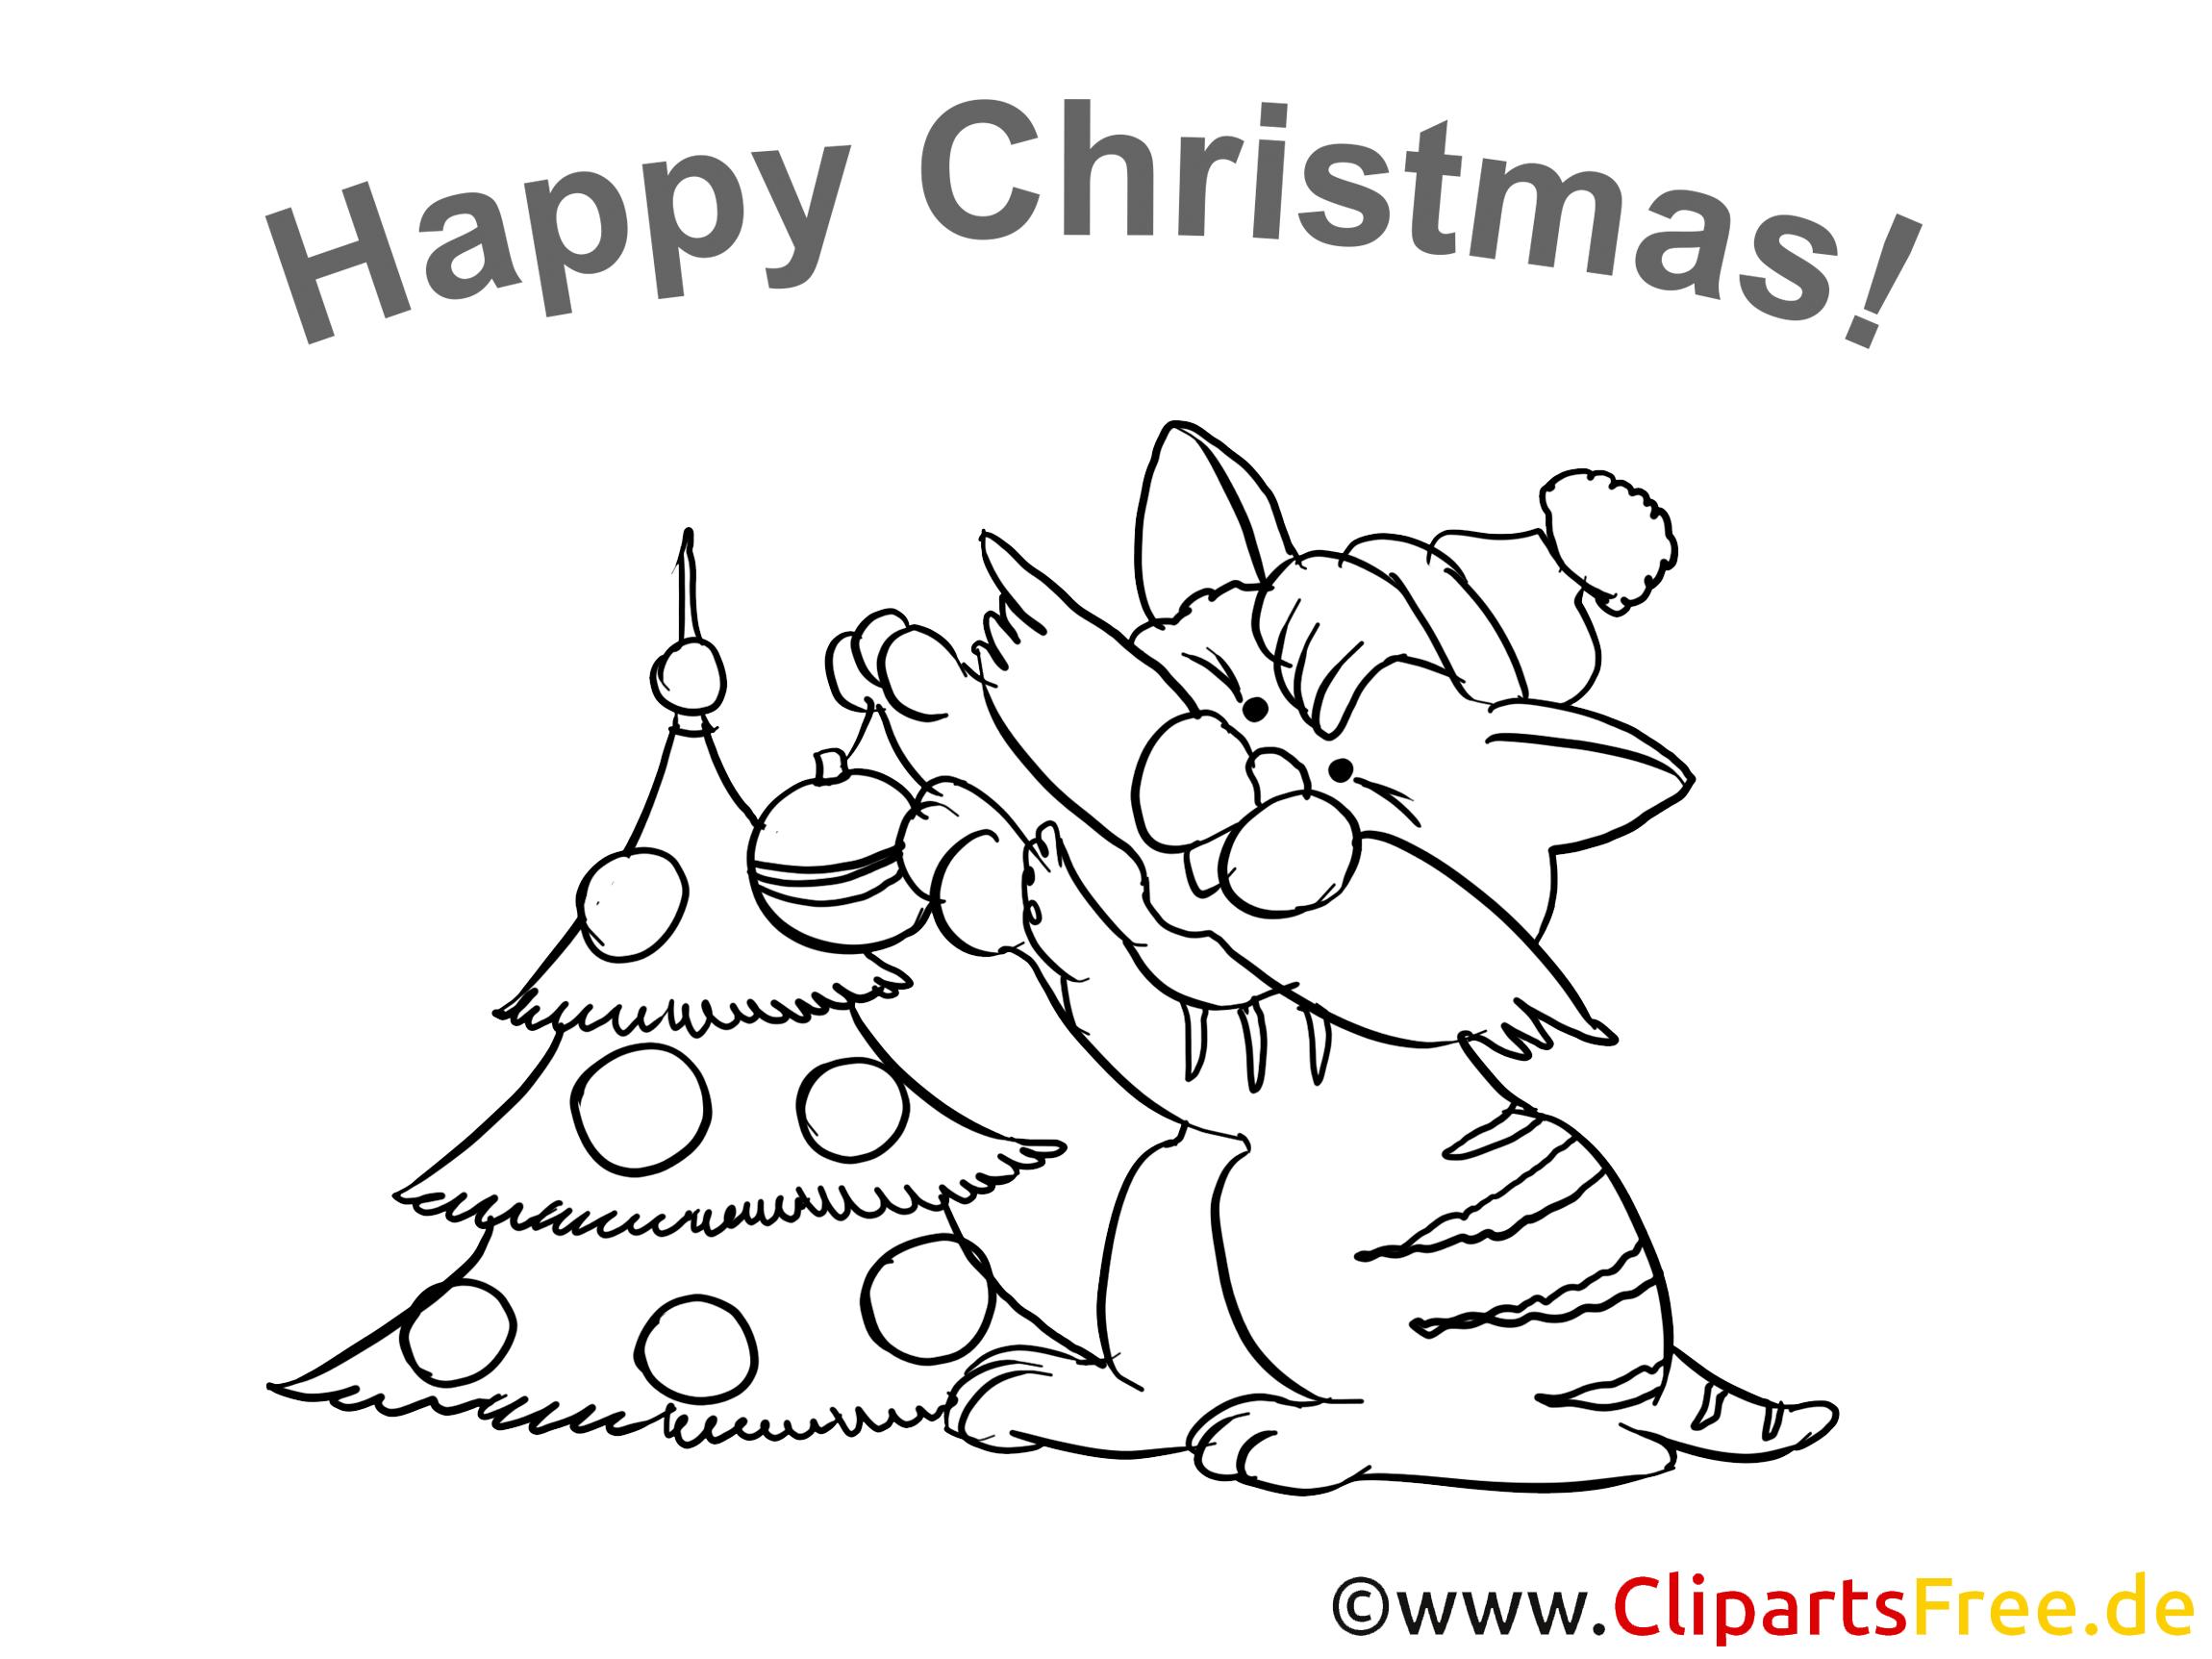 Happy Christmas Colouring Sheet free